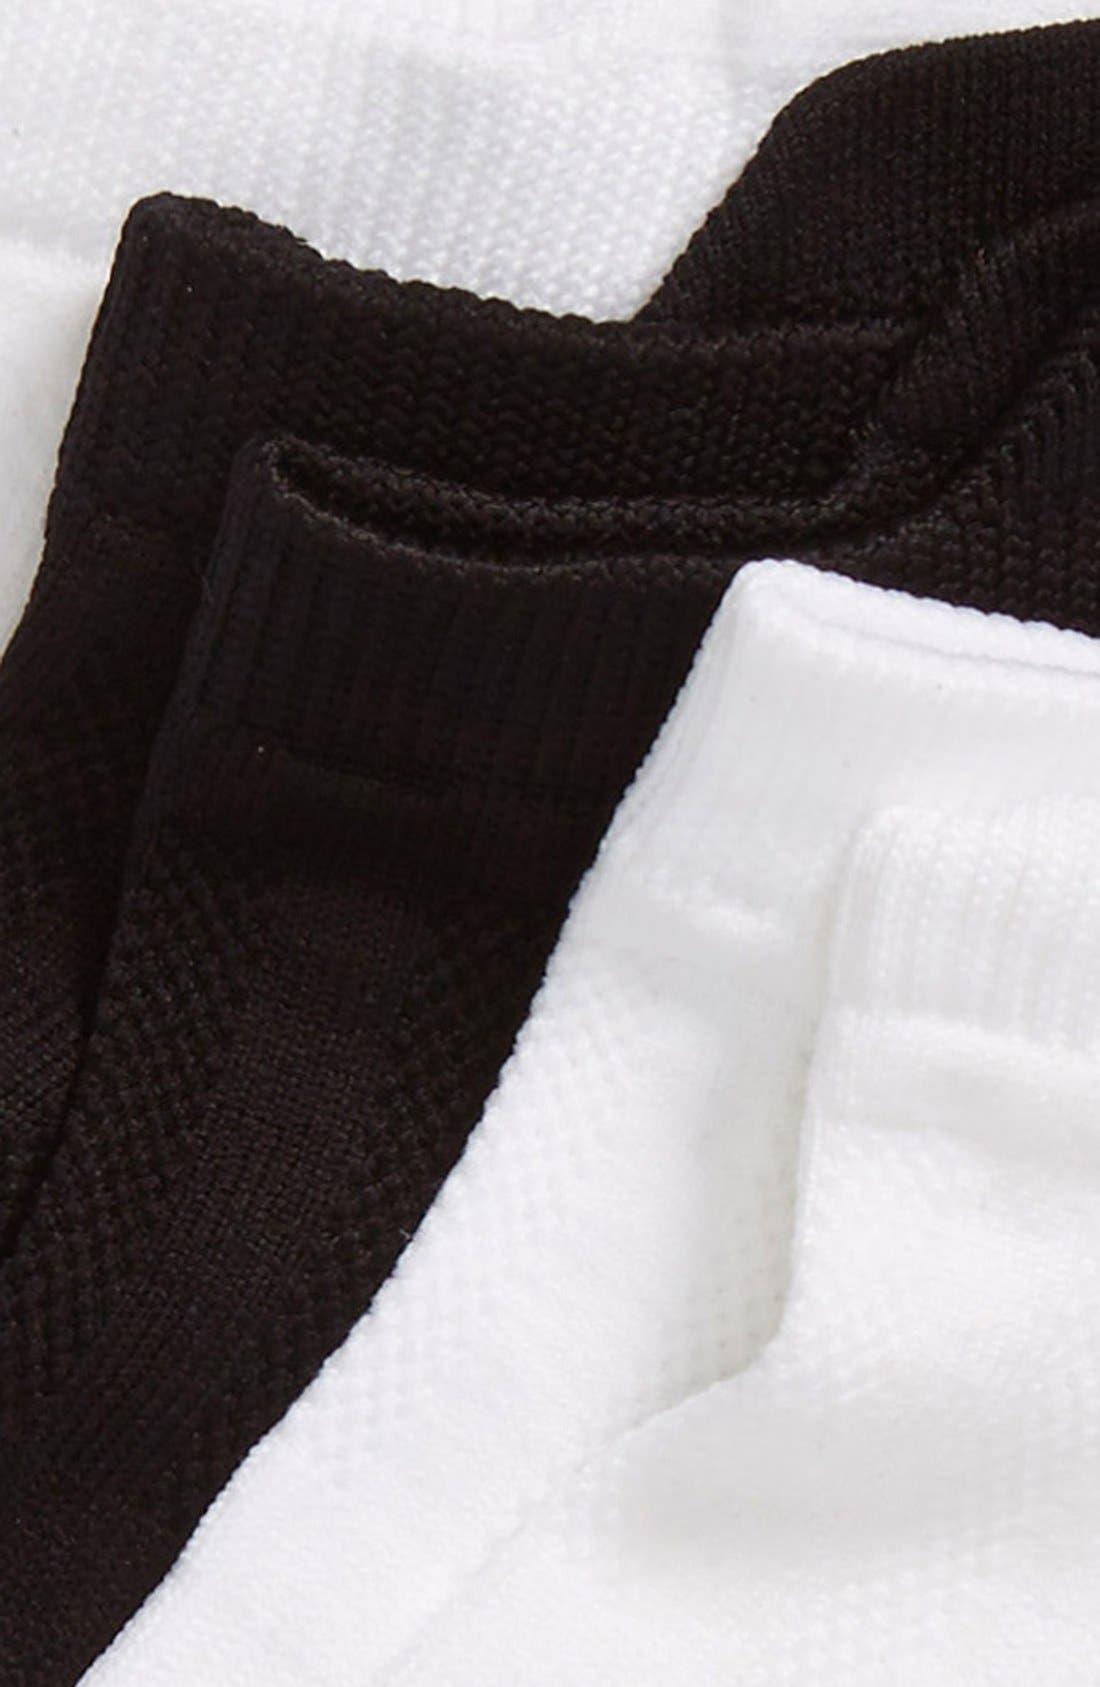 3-Pack Microfiber Tab Performance Socks,                             Alternate thumbnail 9, color,